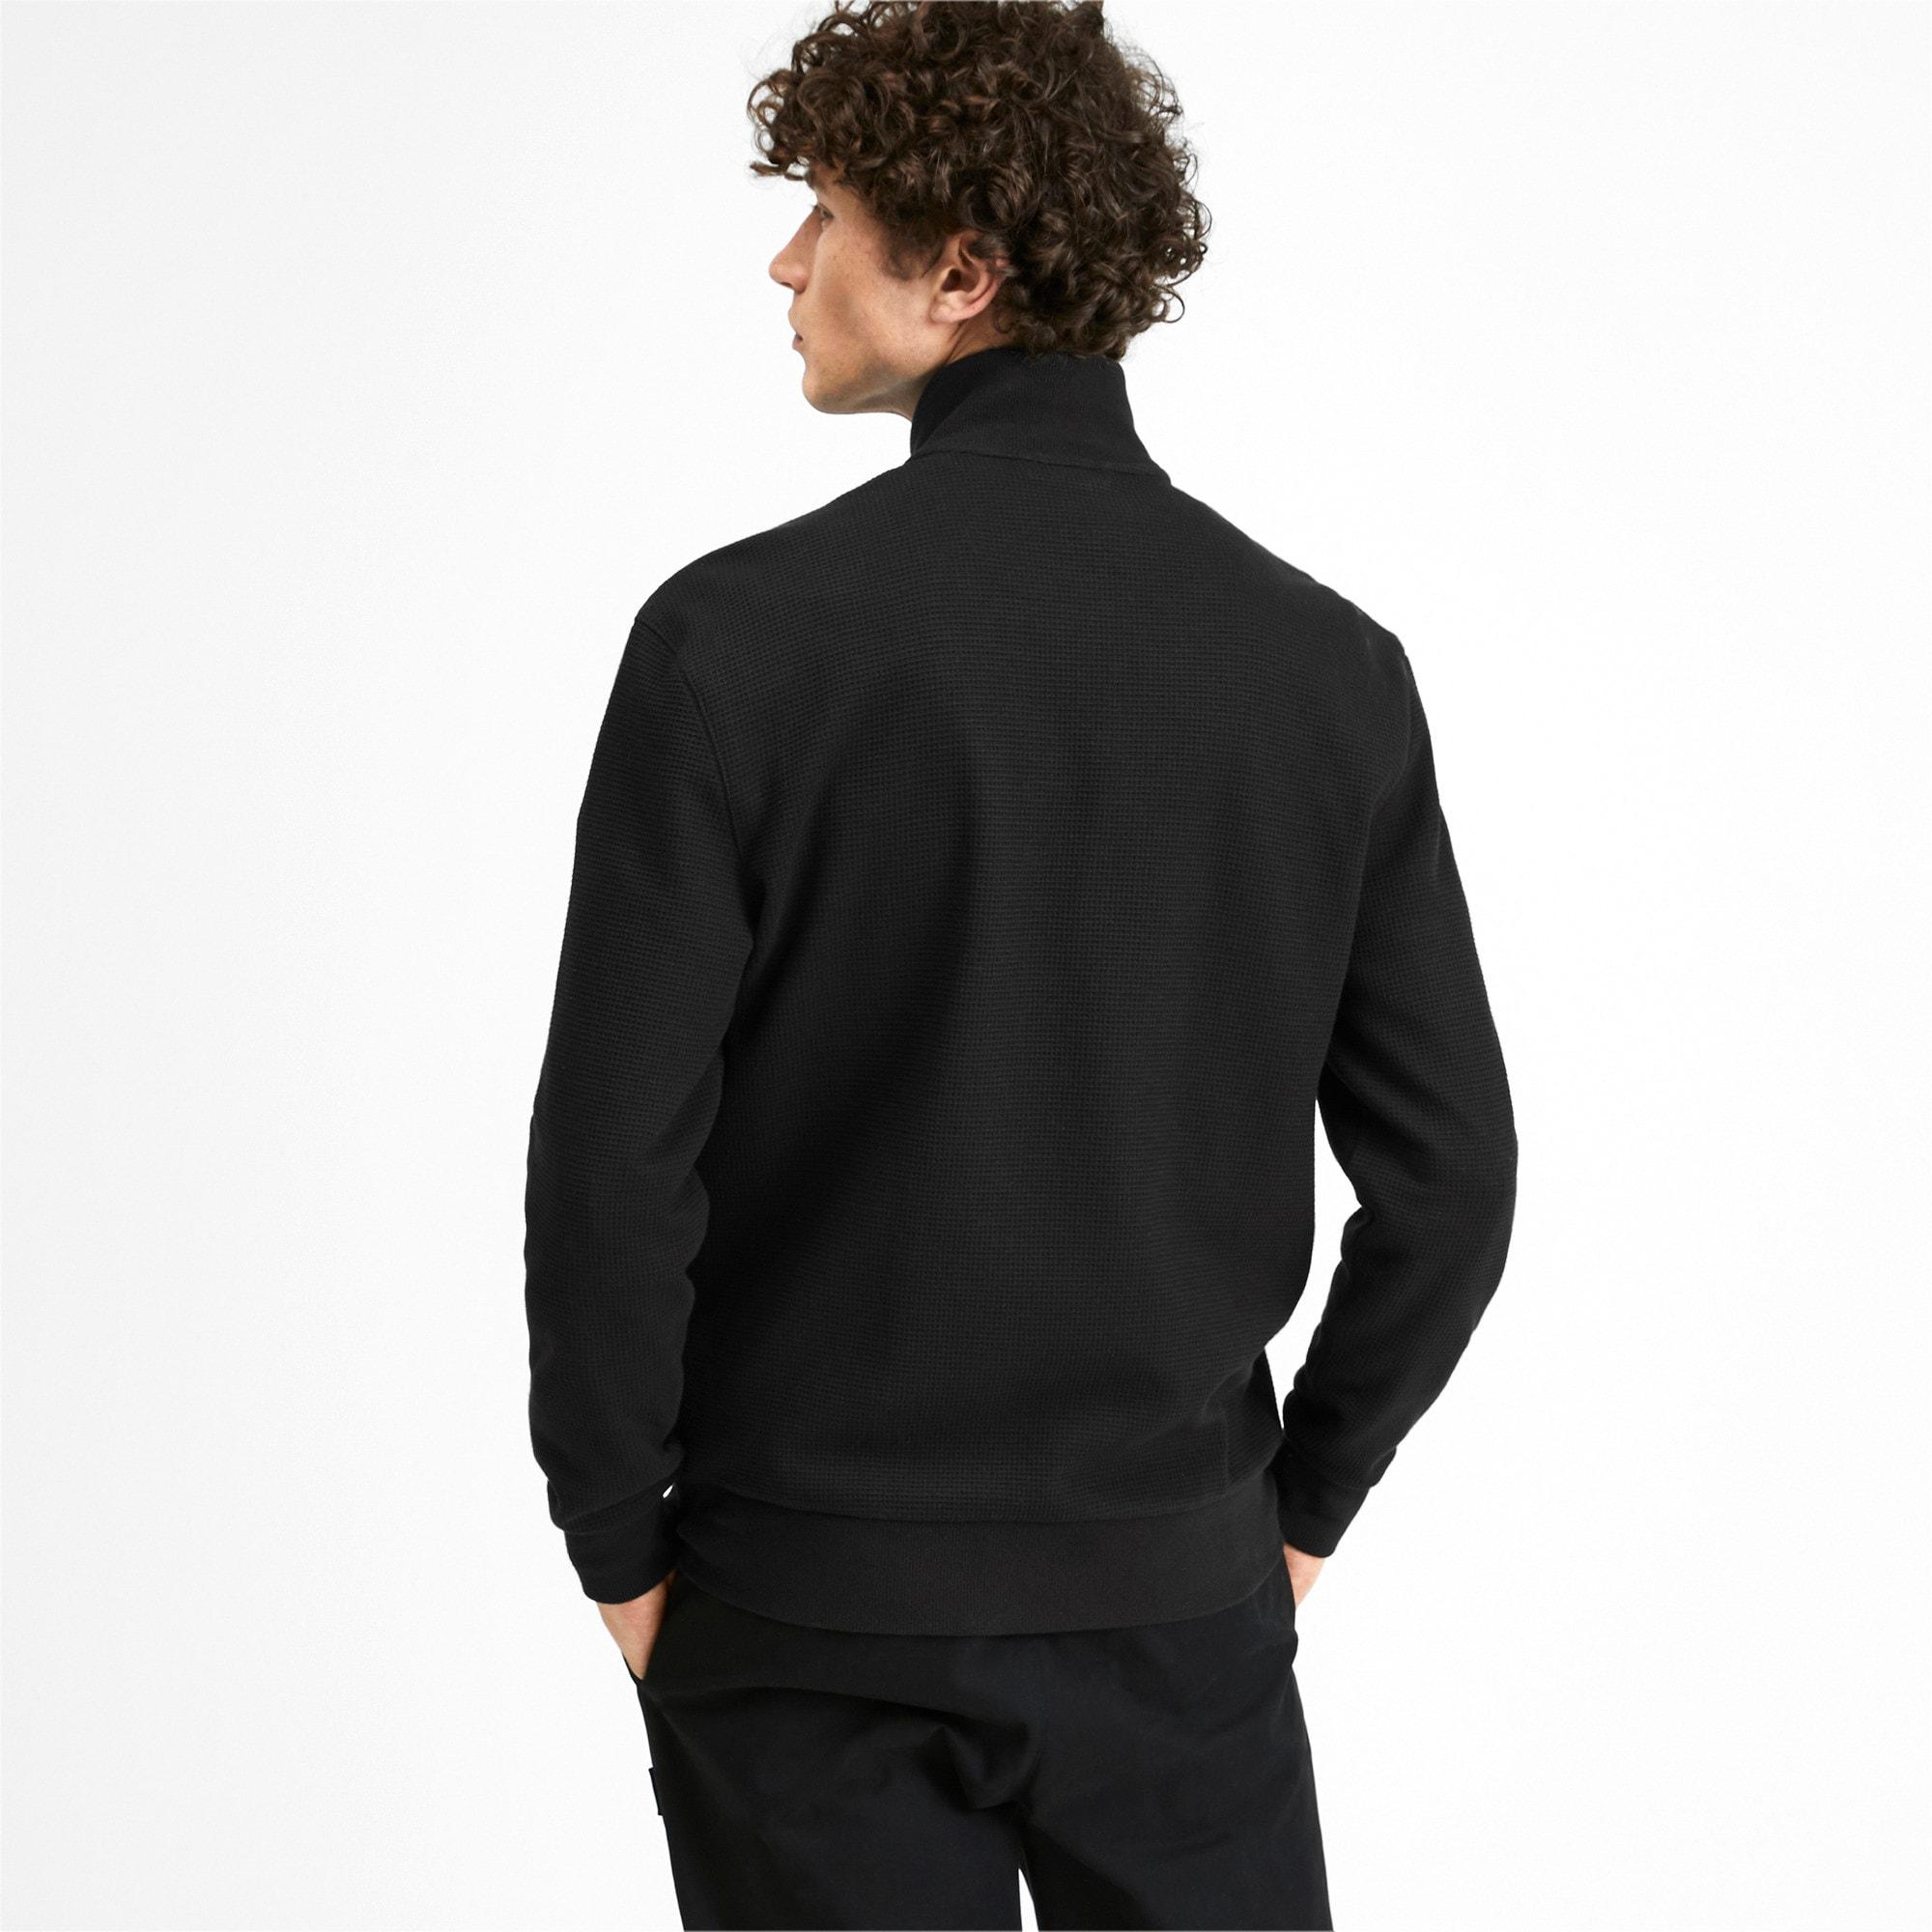 Thumbnail 2 of Fusion Men's Jacket, Puma Black, medium